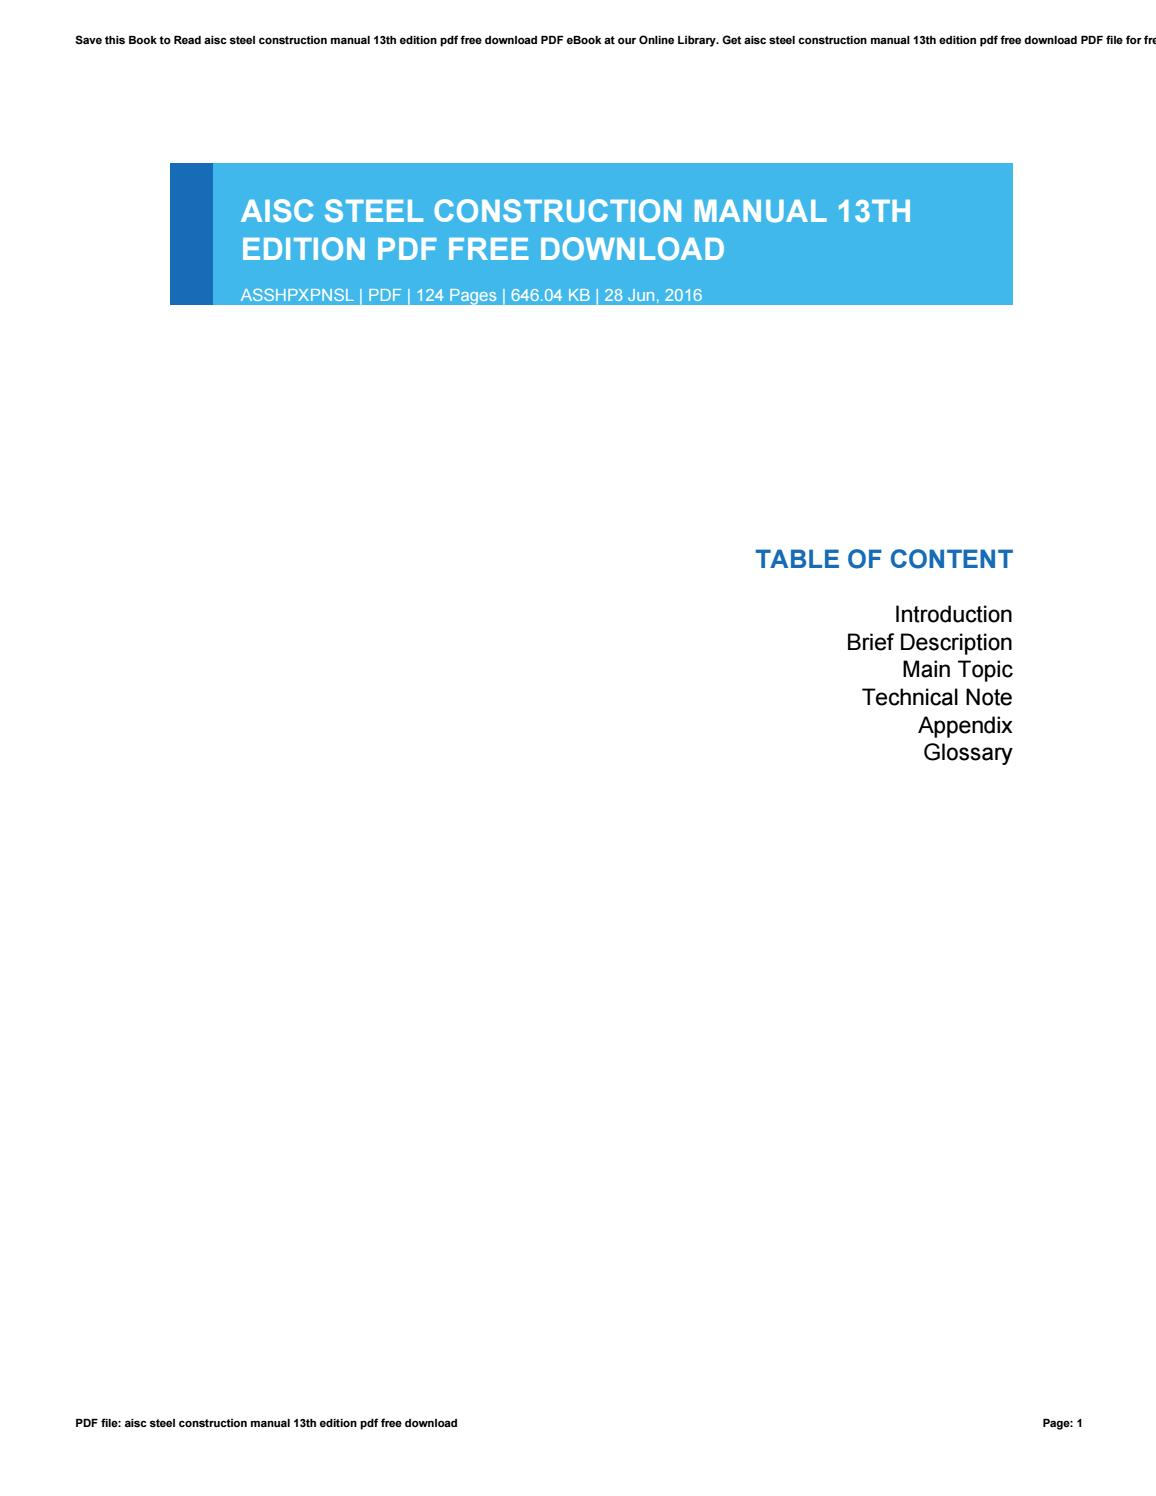 Aisc Manual Aisc Steel Tables Pdf